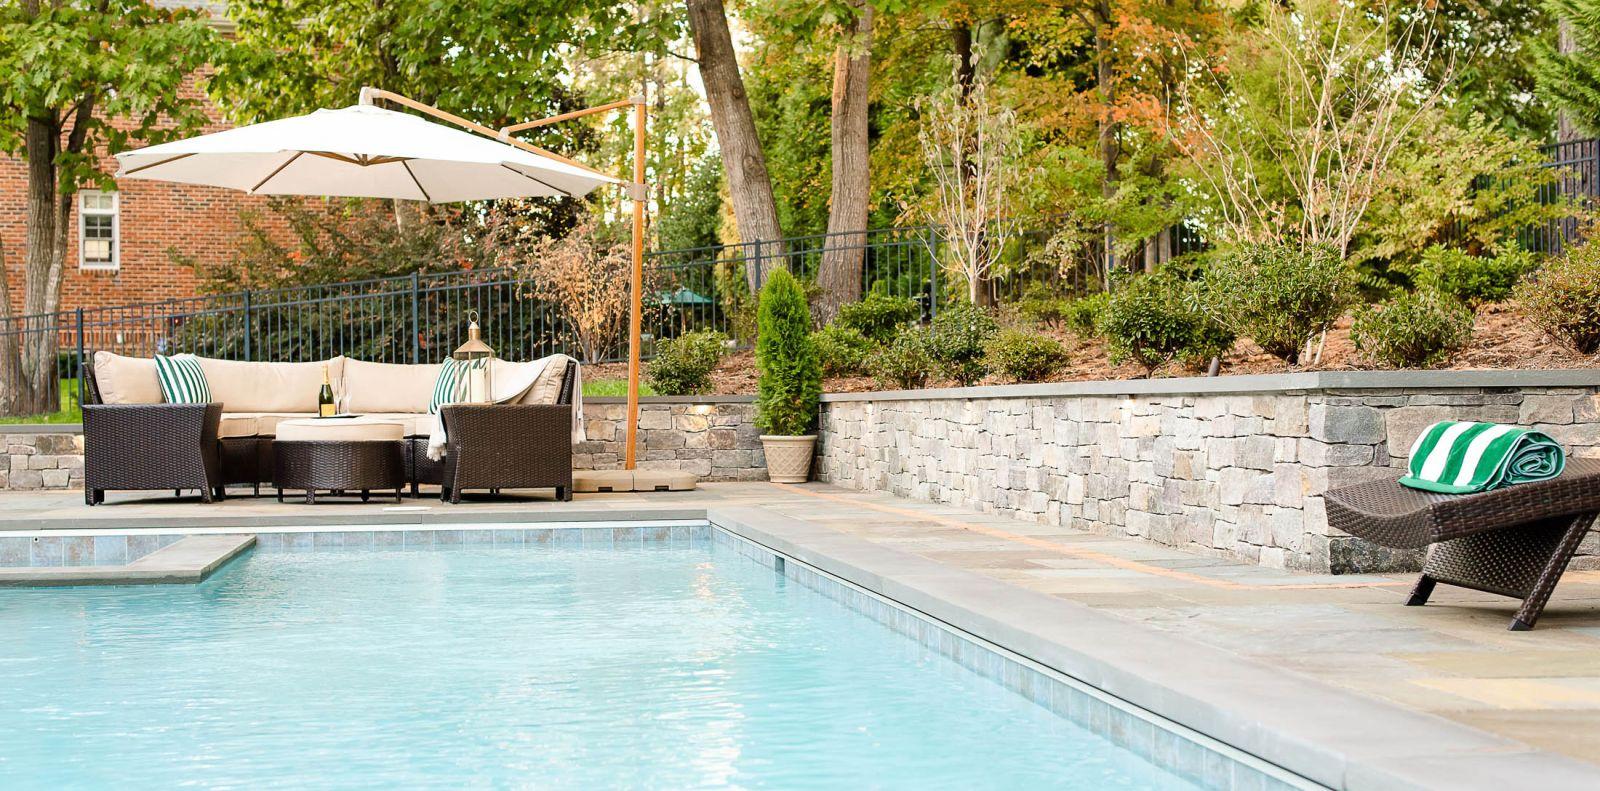 Pool with hot tub and bluestone patio